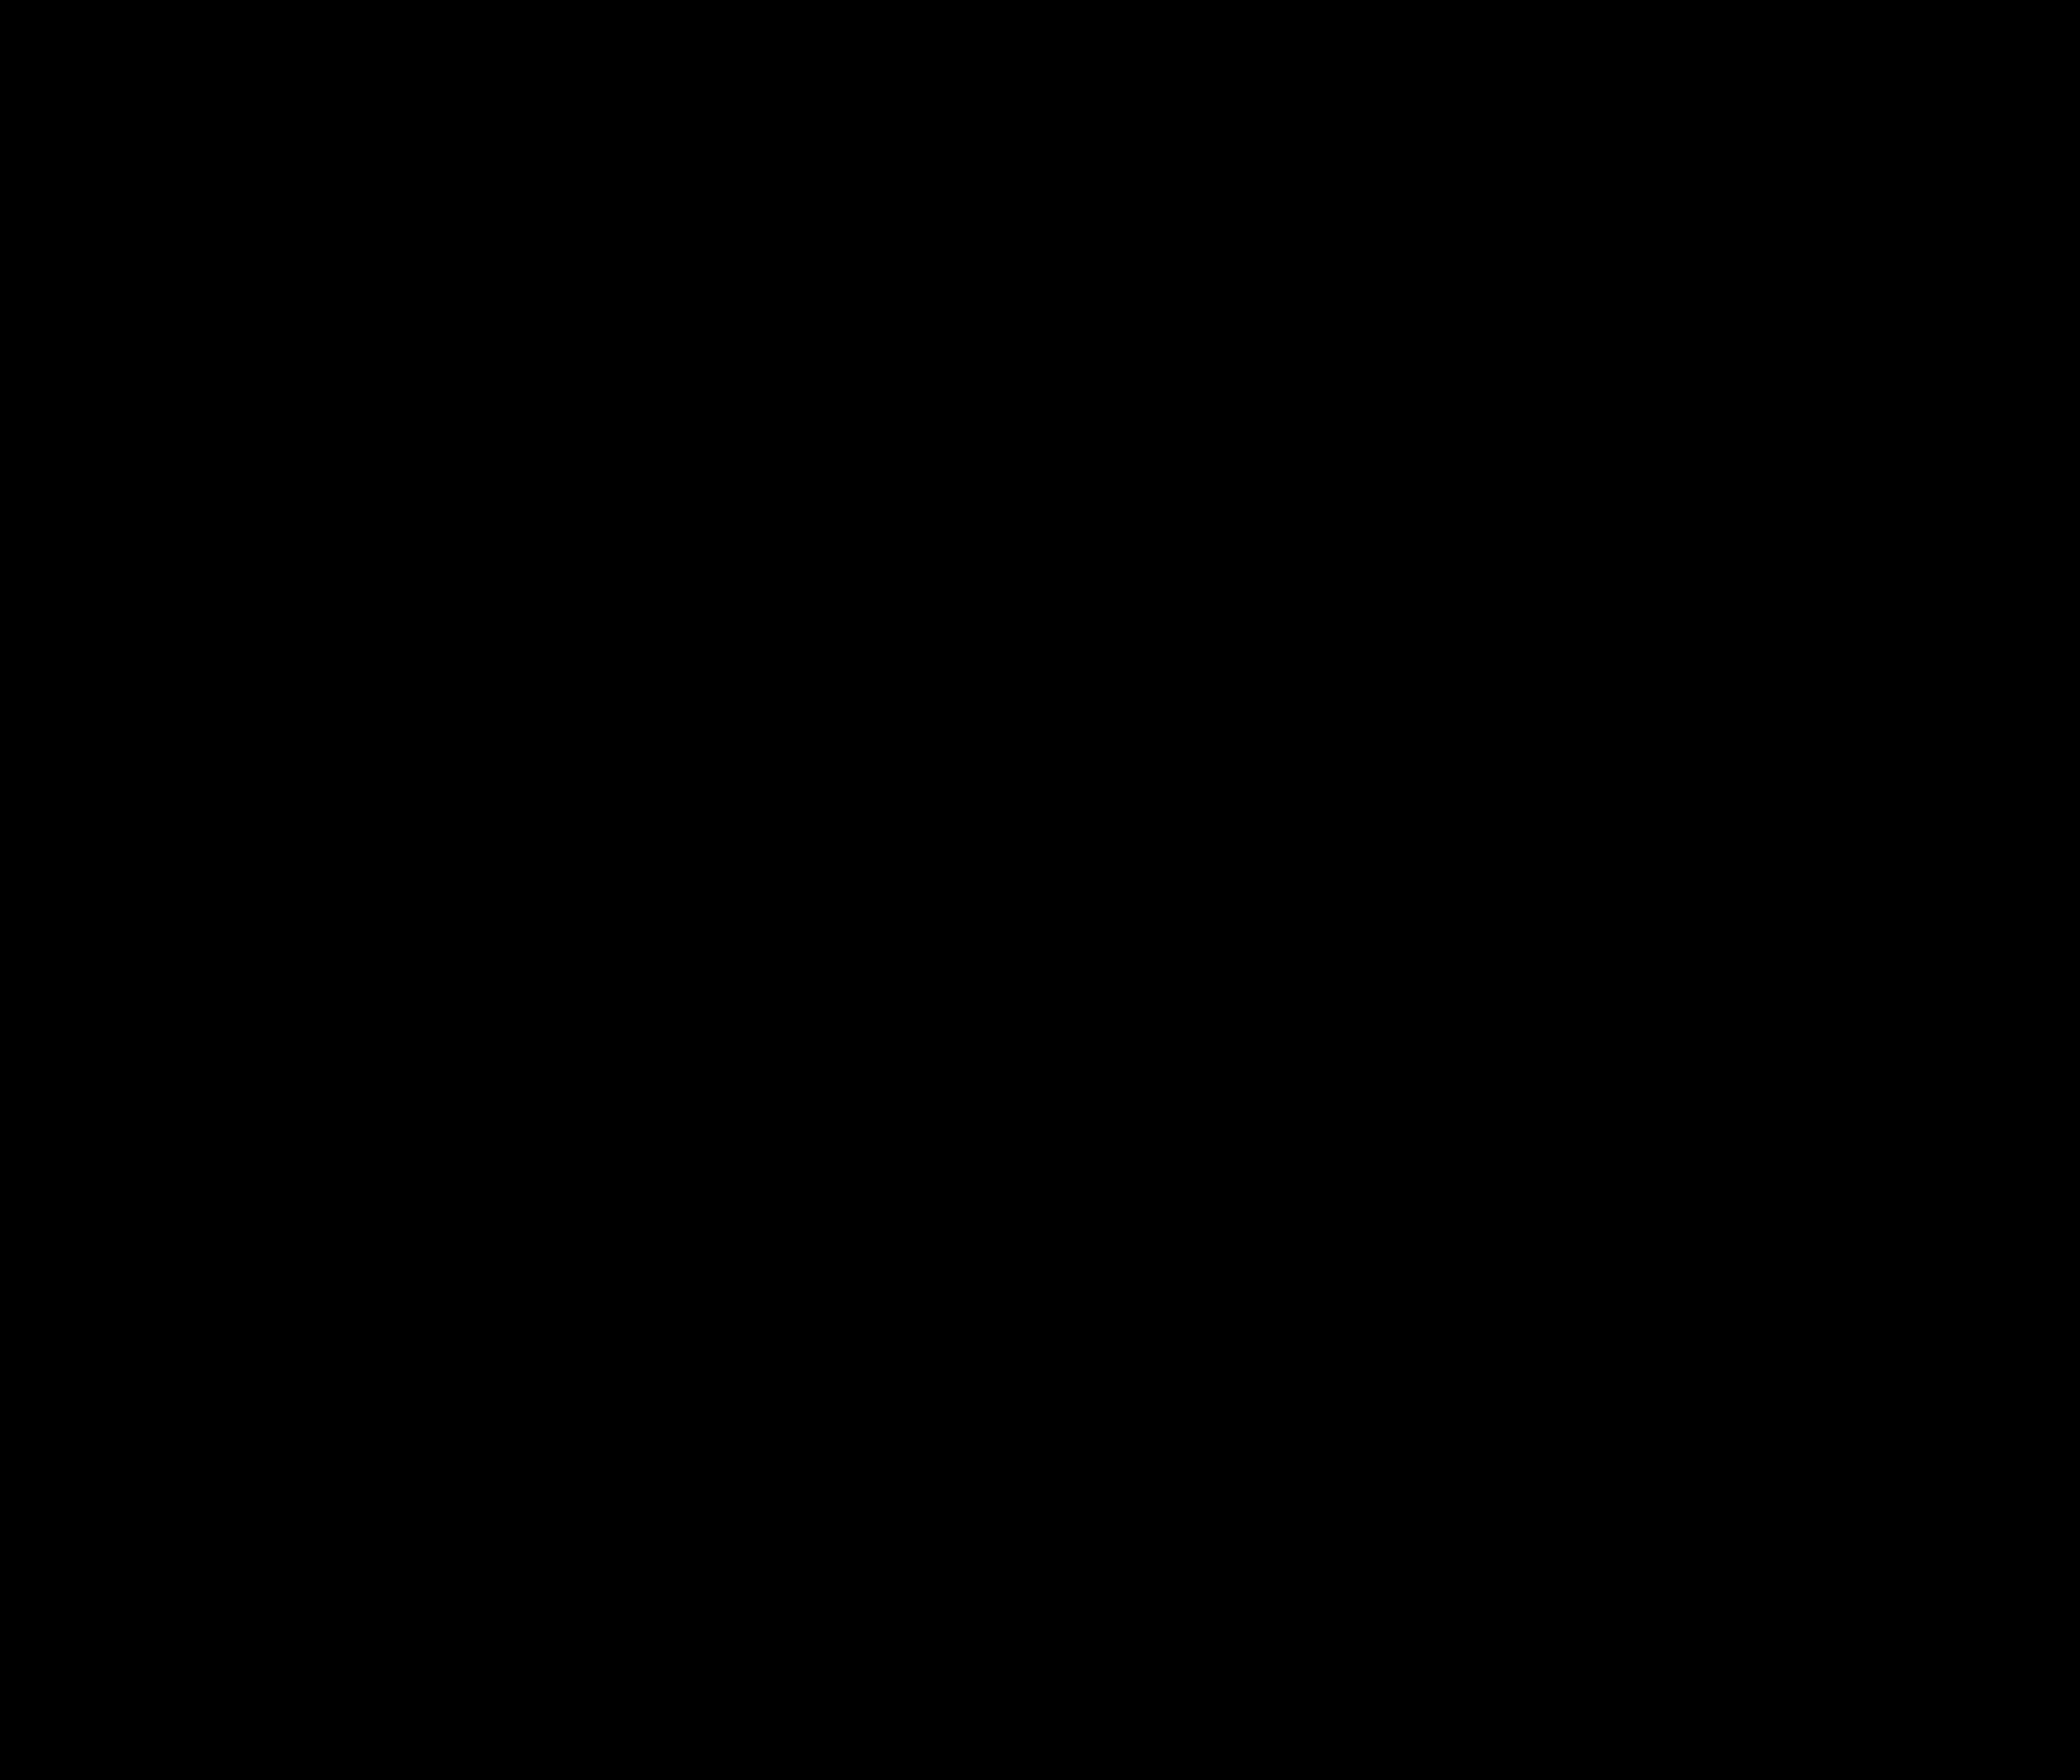 2400x2043 15 Greyhound Vector Silhouette For Free Download On Mbtskoudsalg